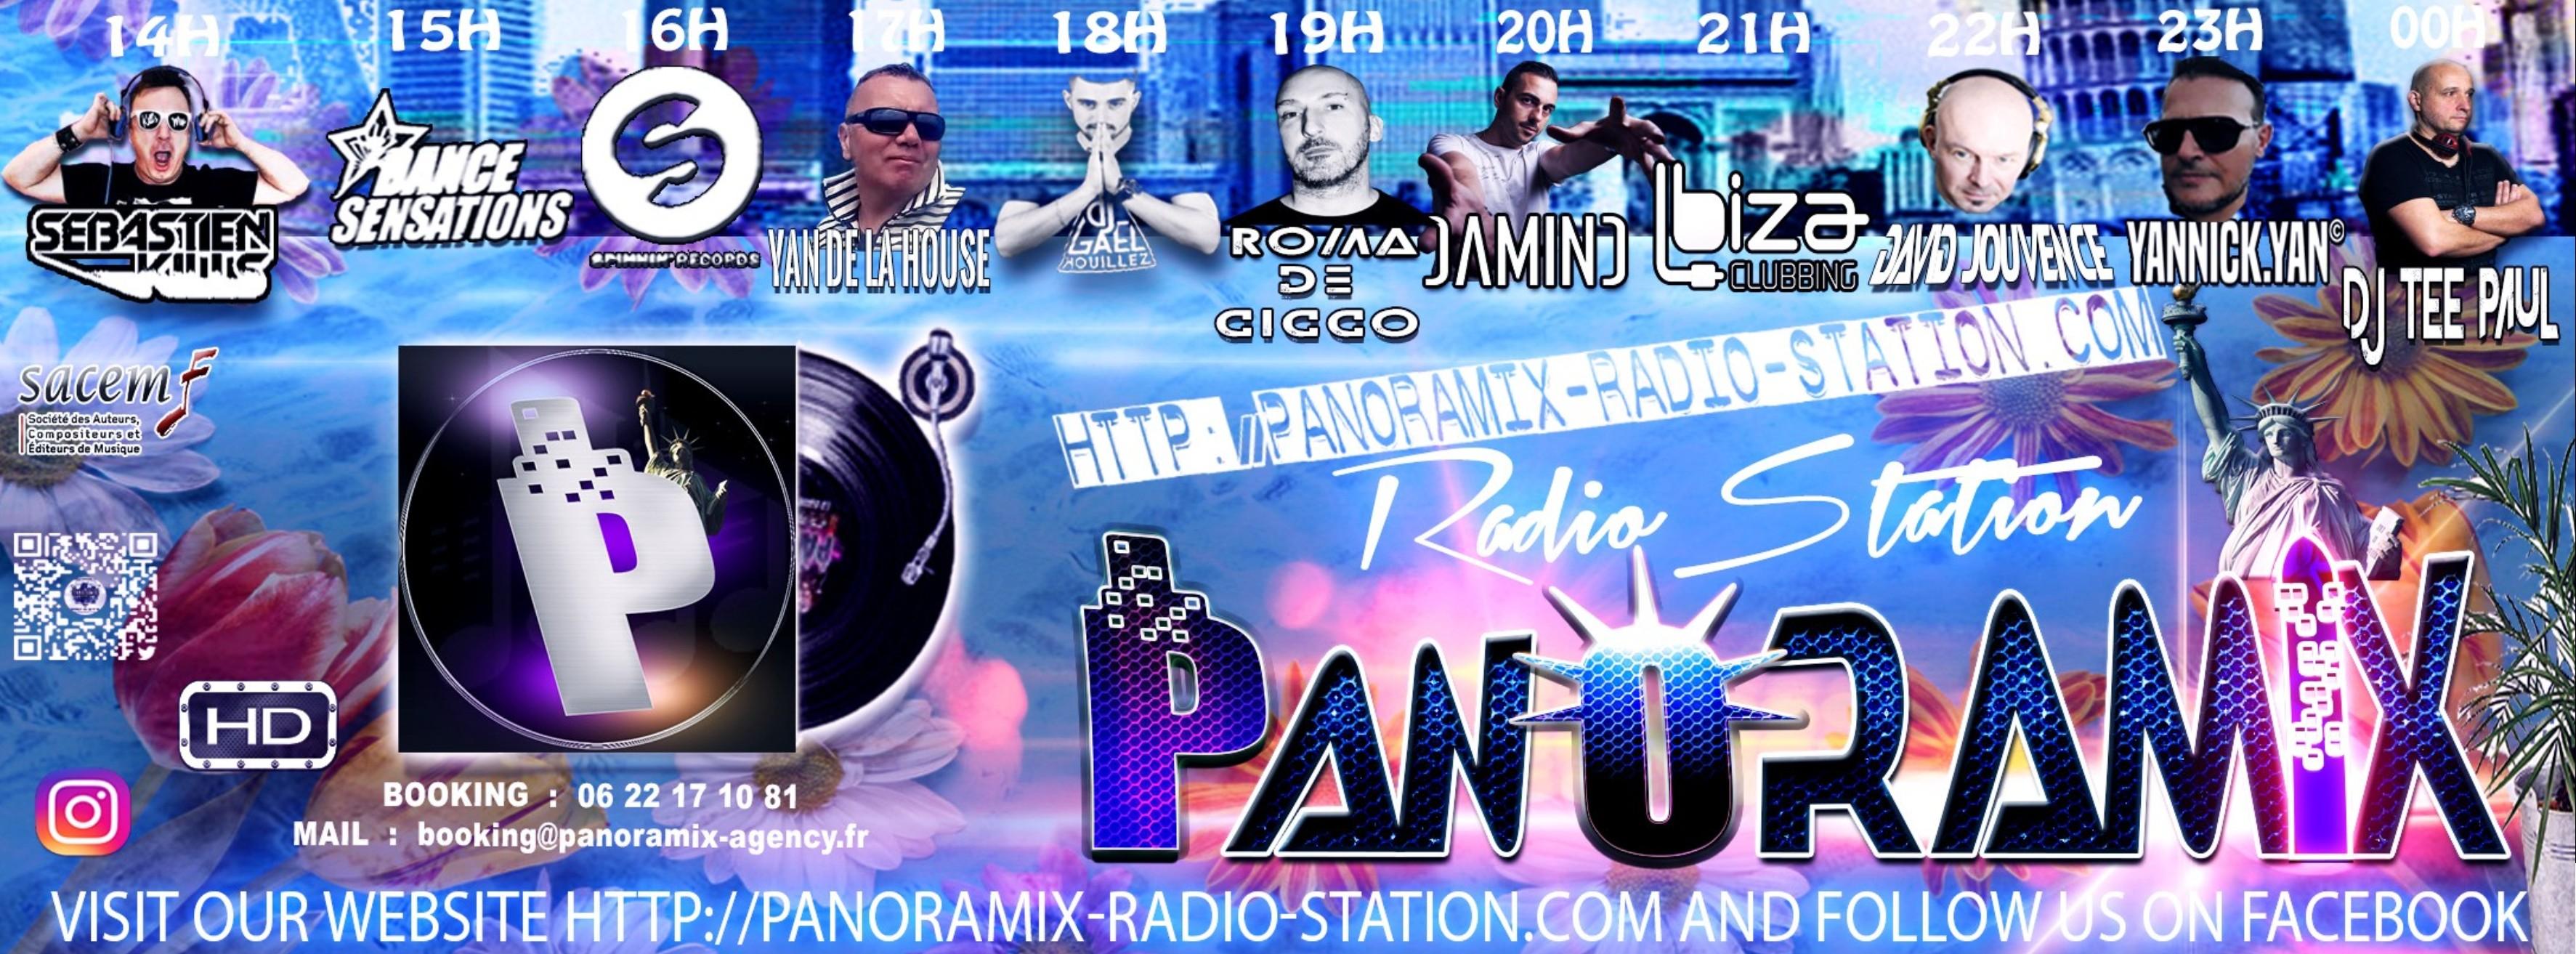 http://panoramix-radio-station.com/wp-content/uploads/2018/07/BANNIERE-djs-panoramix-.jpg